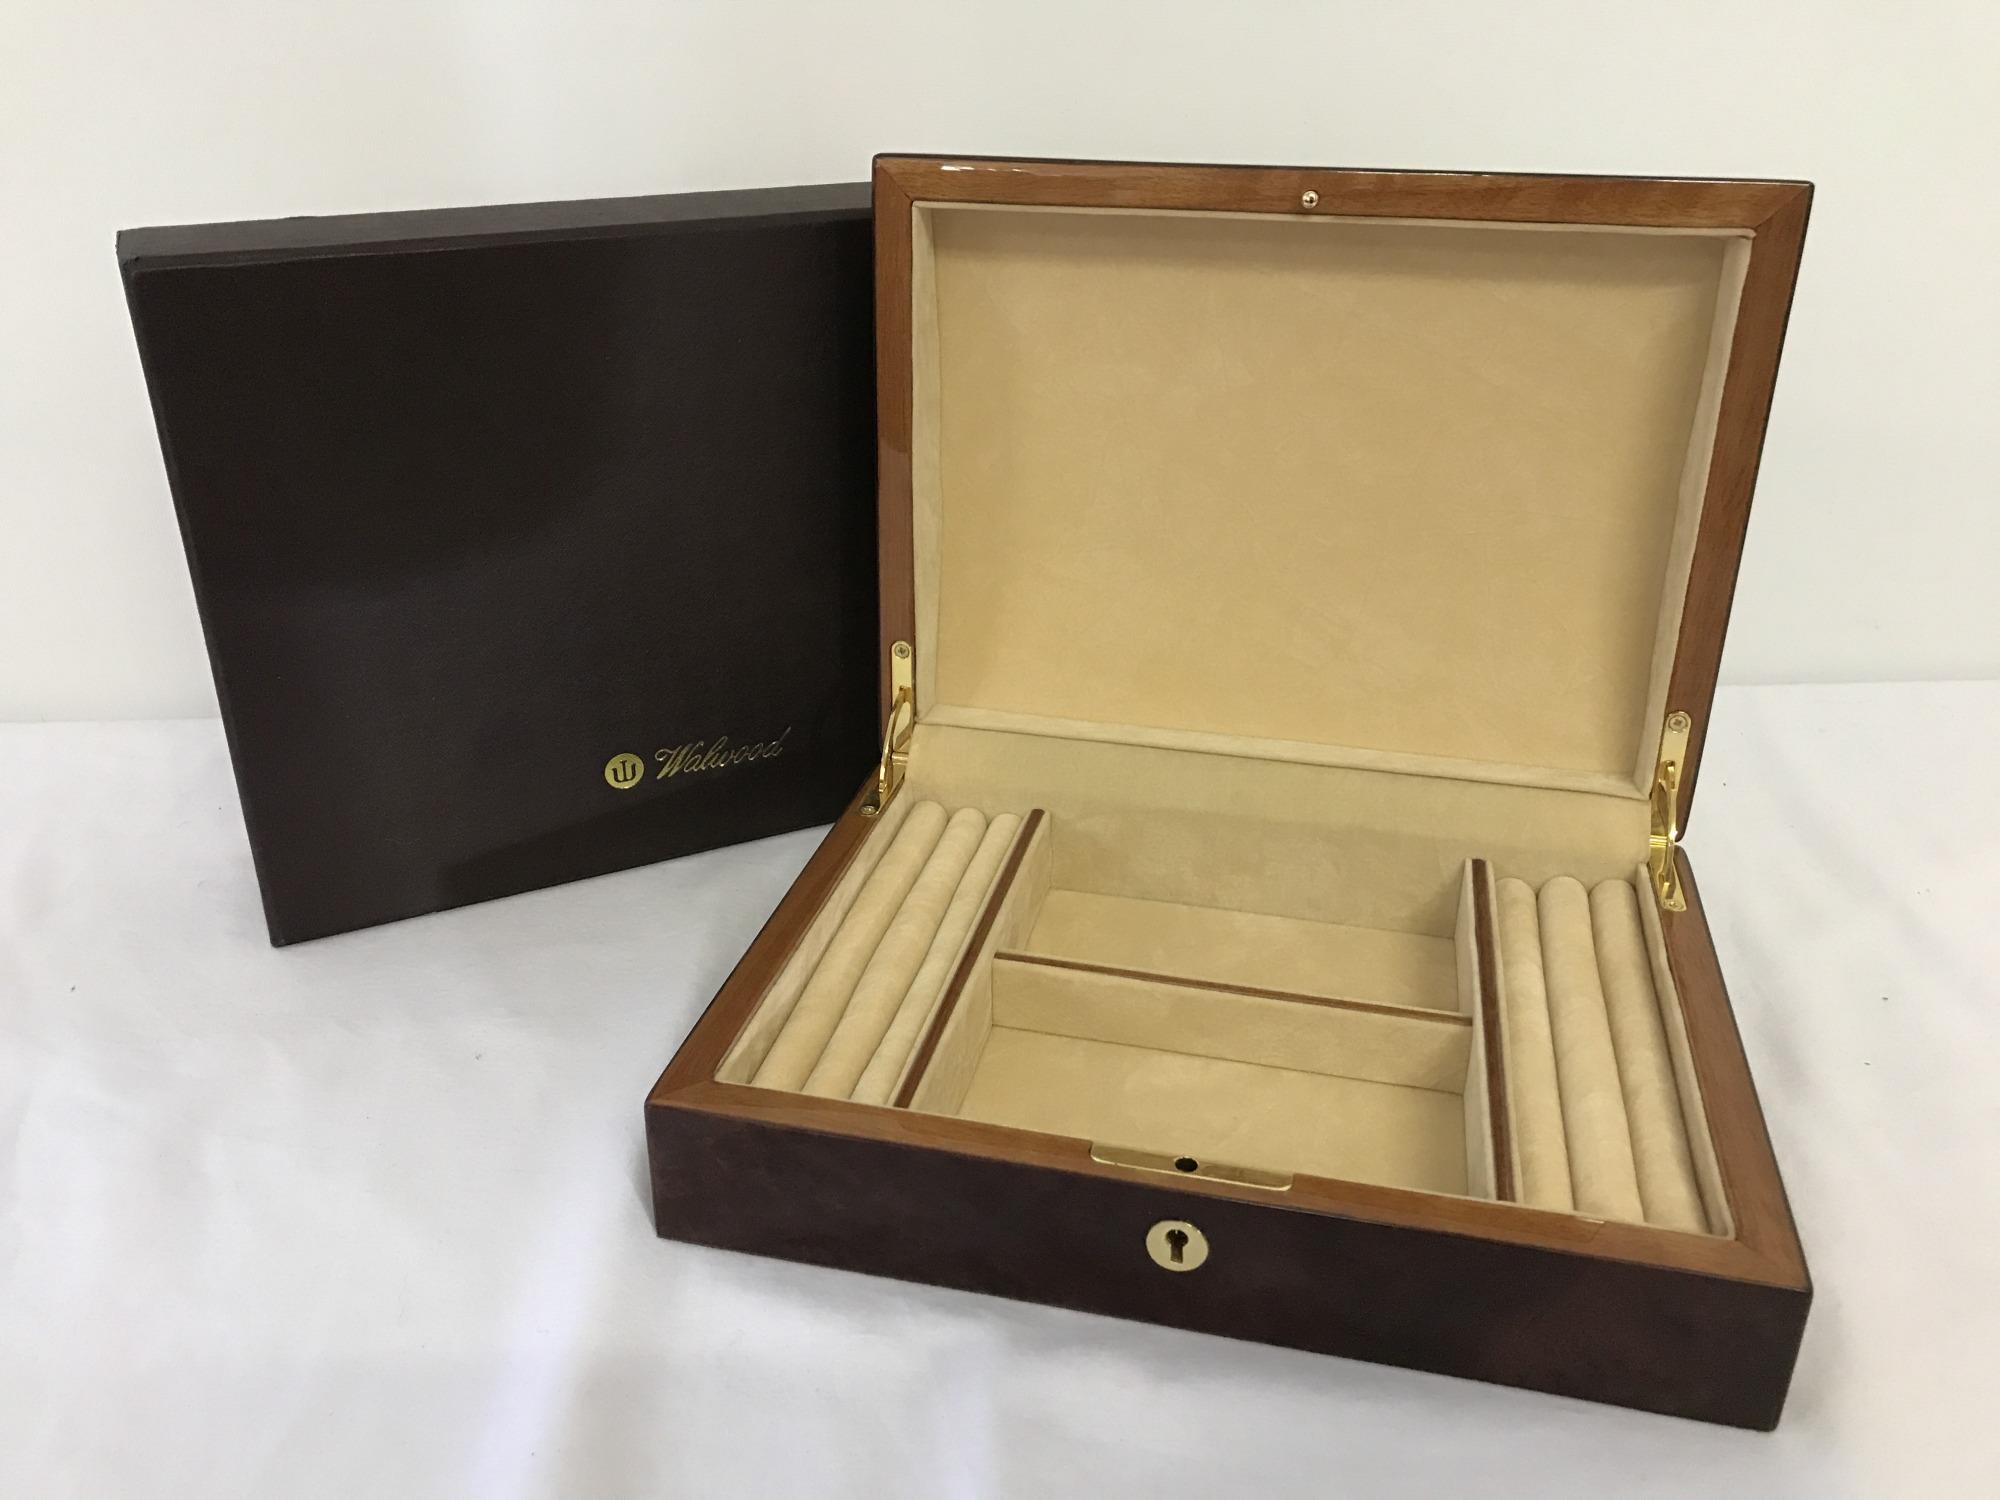 A boxed red Birdseye maple jewellery box by Walwood.